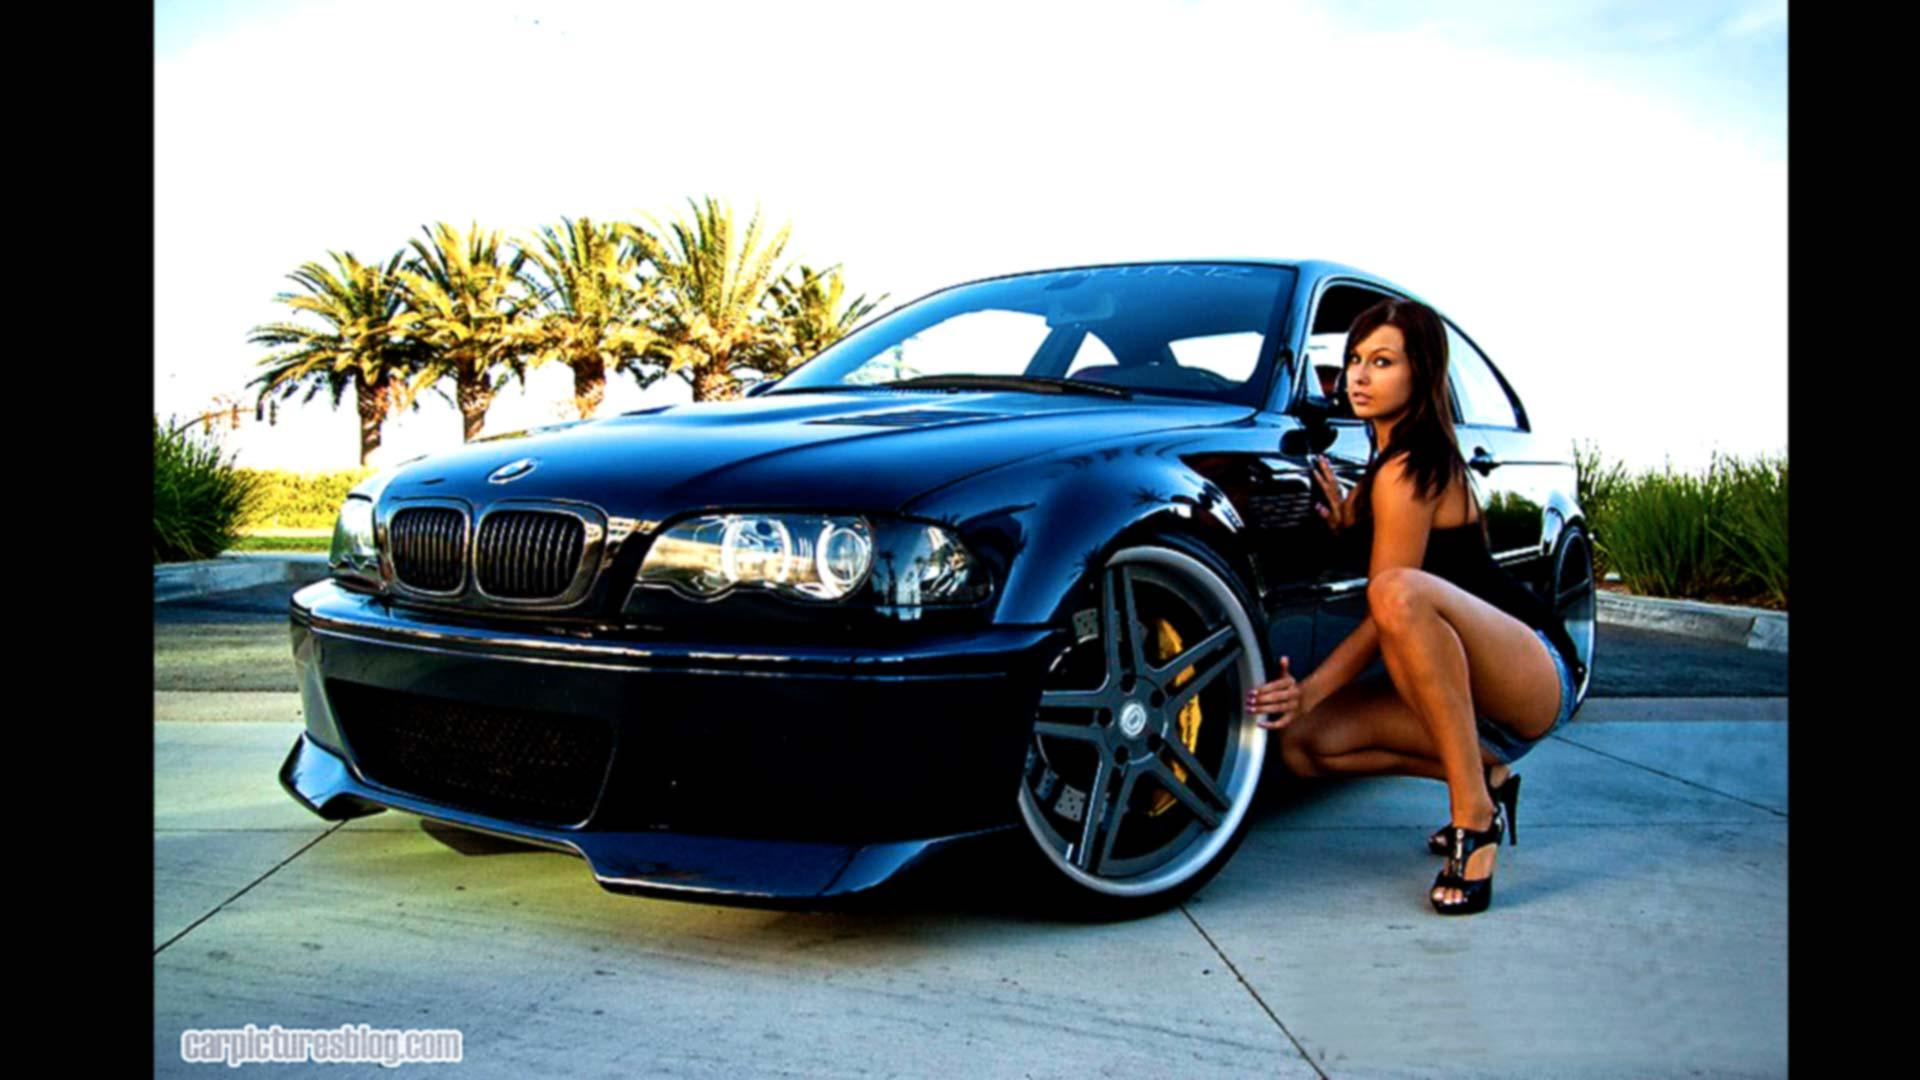 Car Wallpaper of the Day Blue BMW M3 HQ BMW M3 Wallpaper 1920x1080